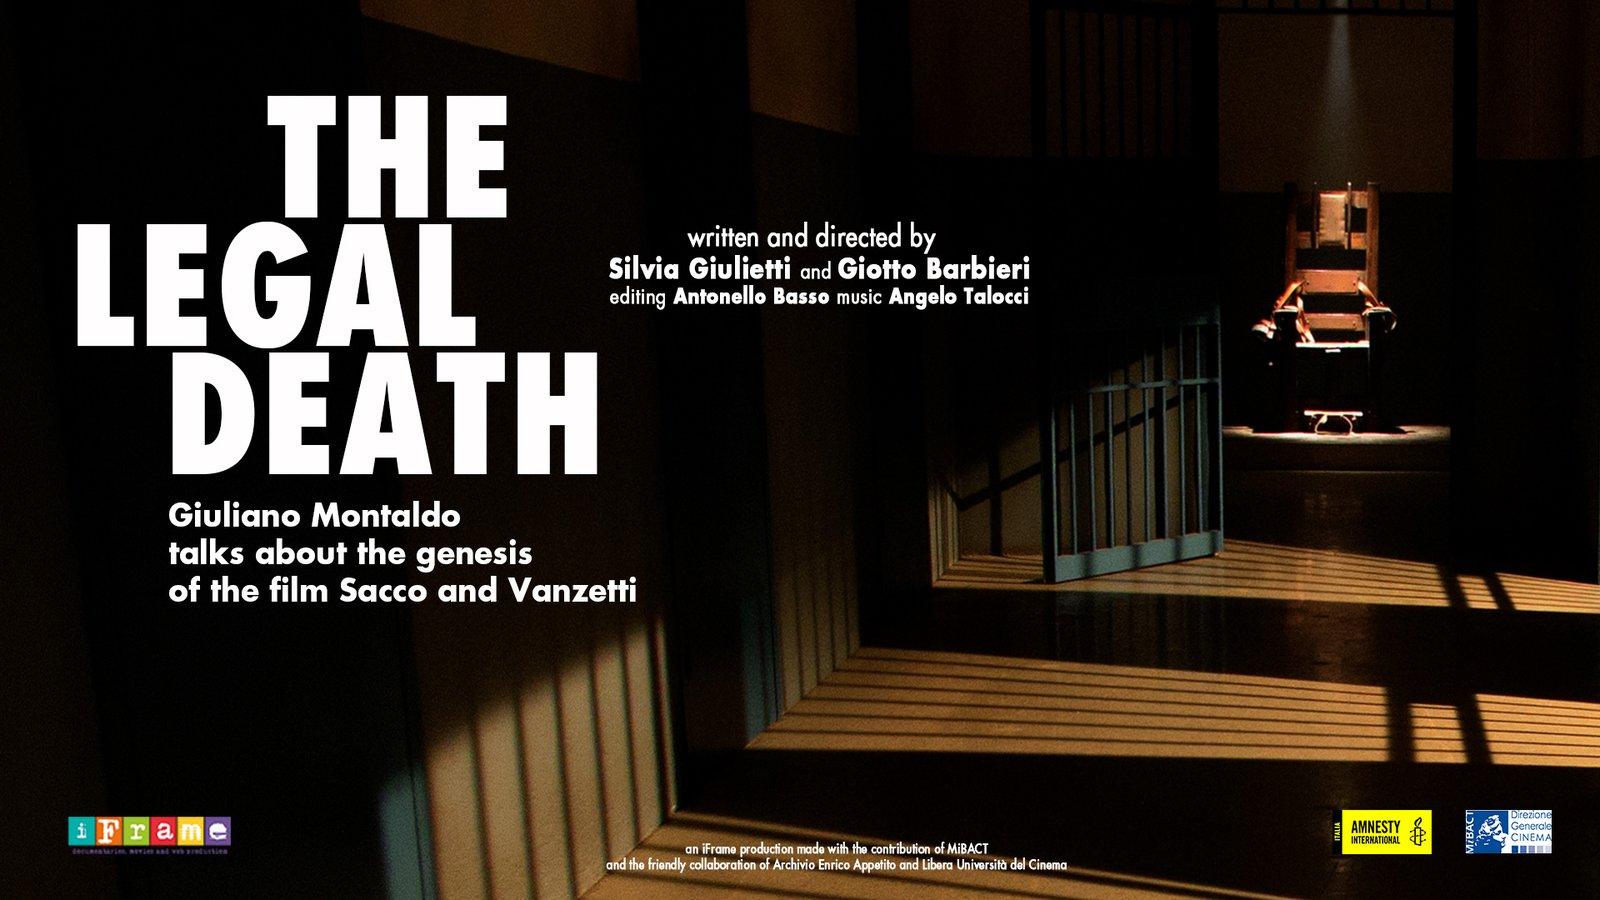 The Legal Death - La morte legale